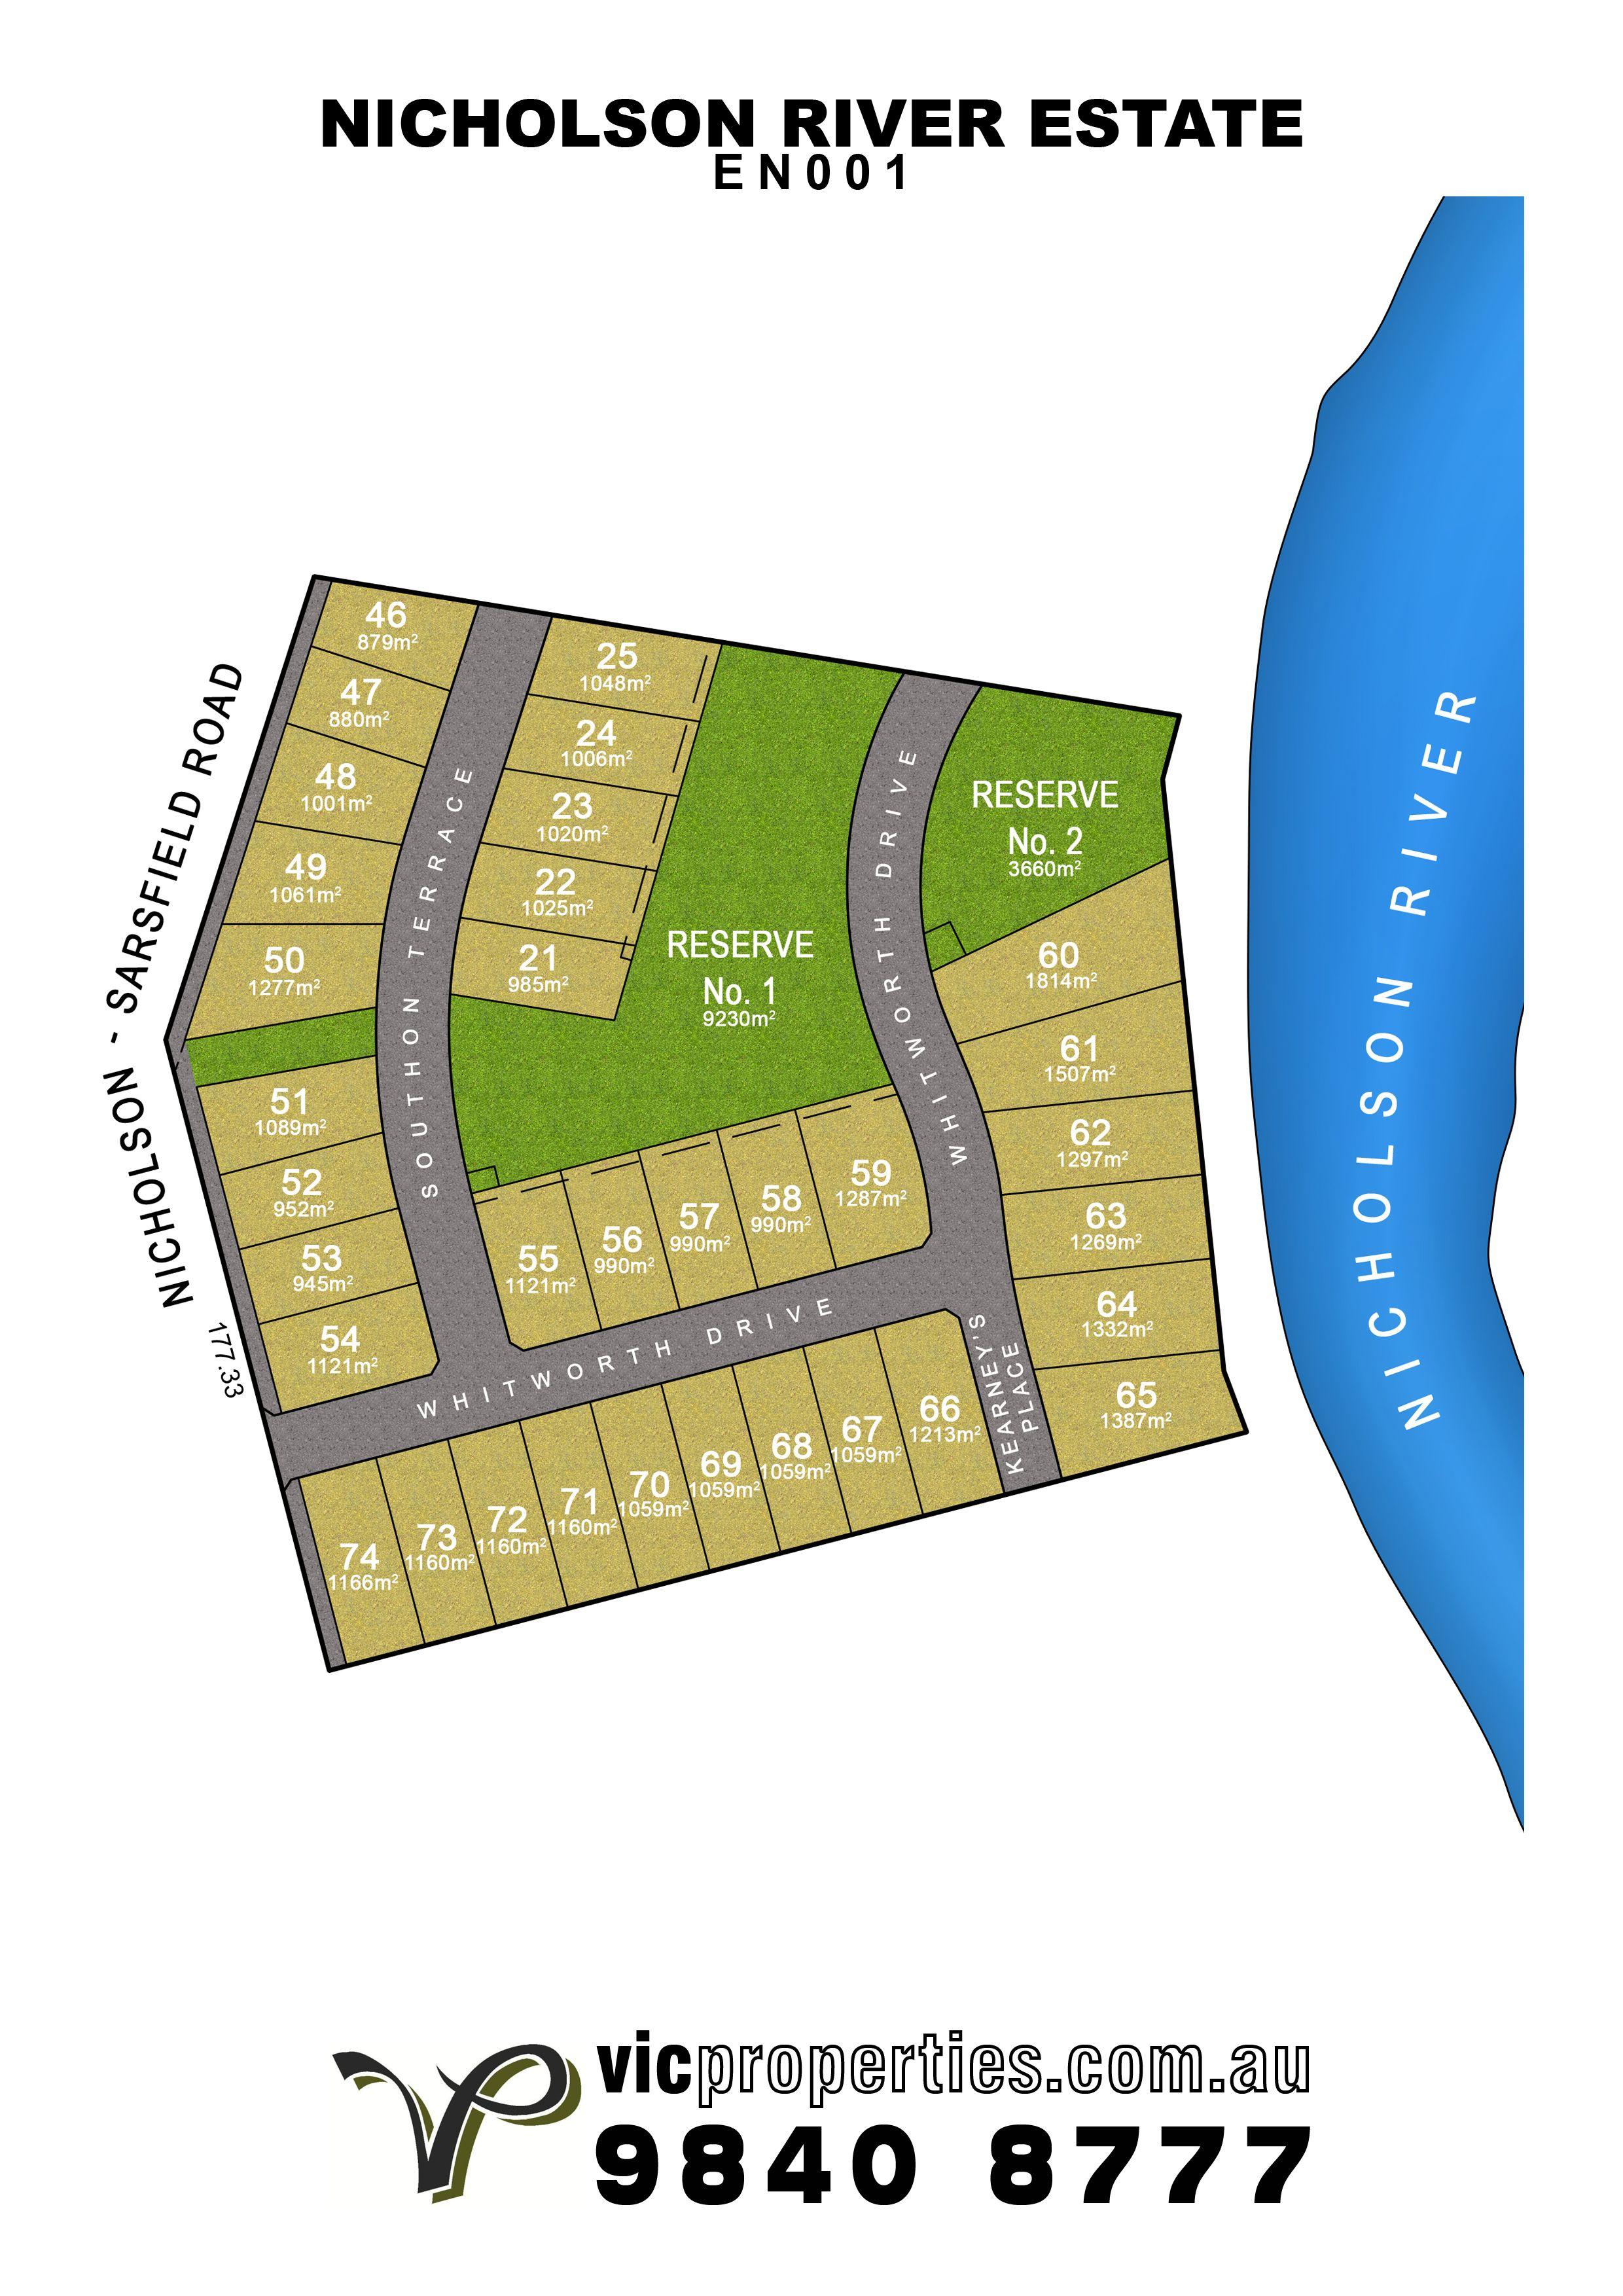 Lot 56/11 Whitworth Drive, Nicholson VIC 3882